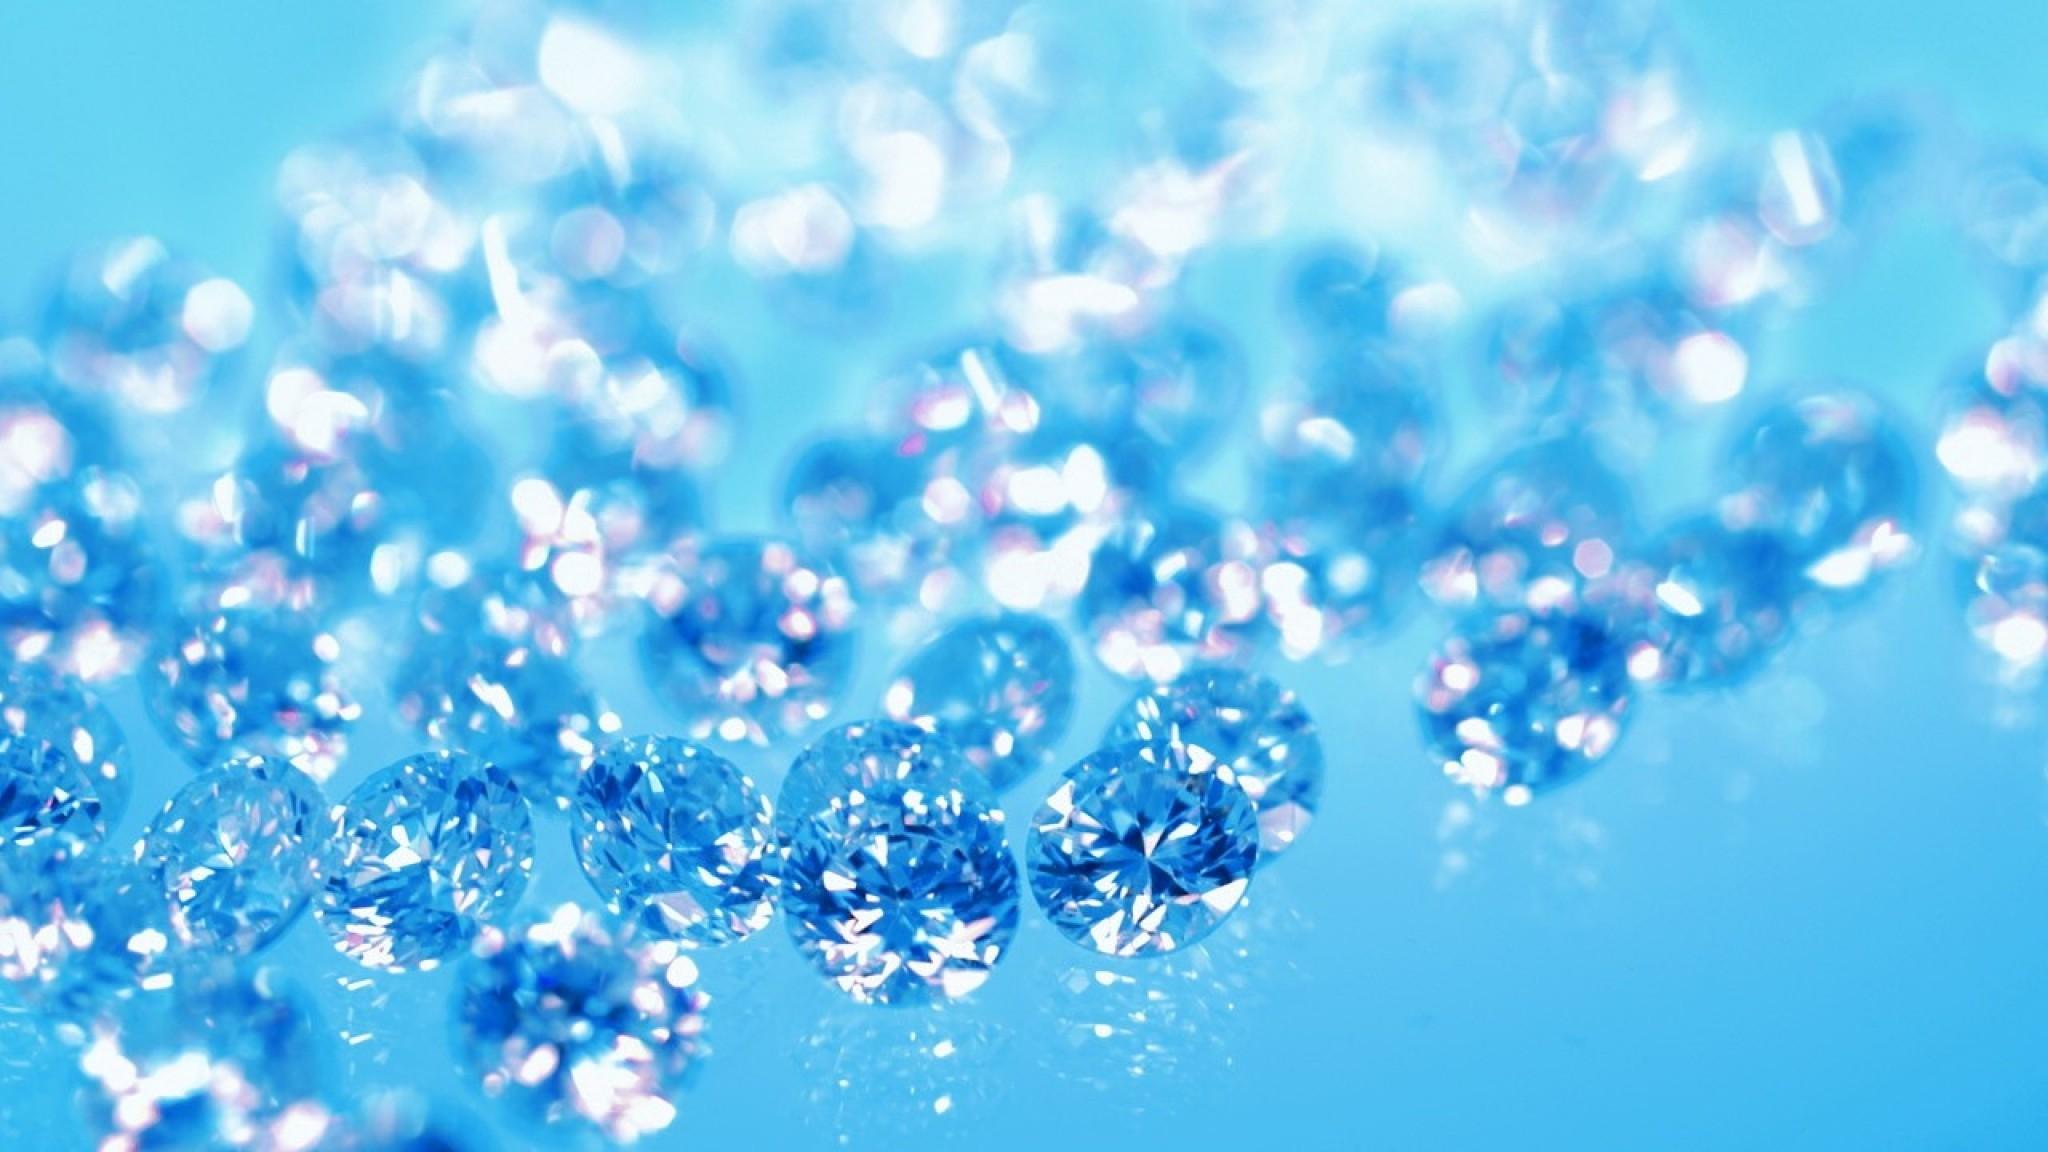 Res: 2048x1152, Blue Diamonds Wallpaper Hd